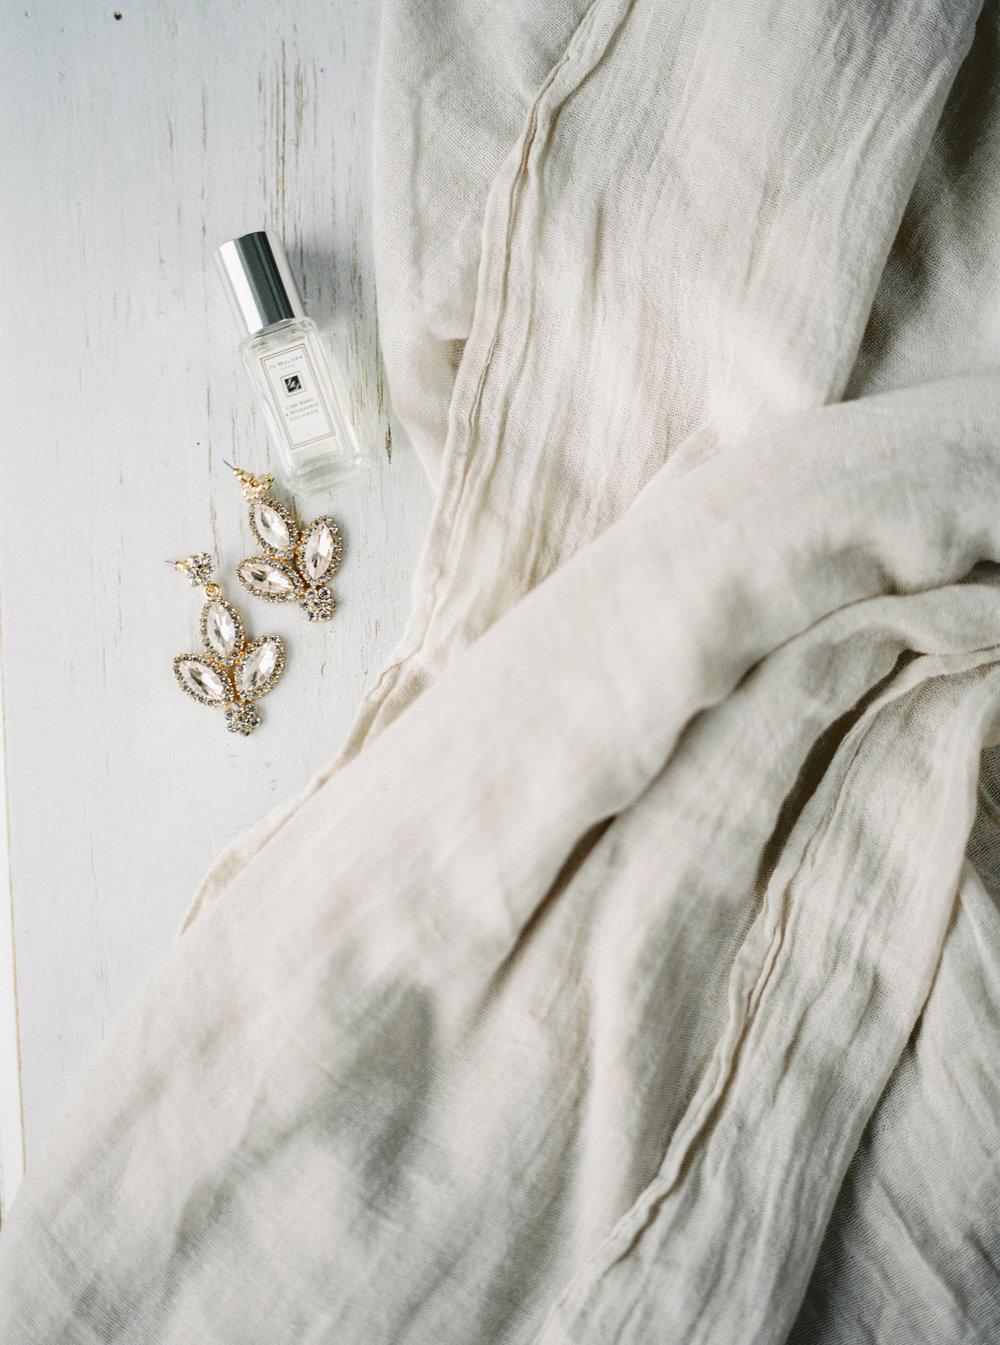 Luxury Wedding Planner UK | Our Chic & Romantic Engagement Shoot in Bath | Katie Julia Photography - 29.JPG